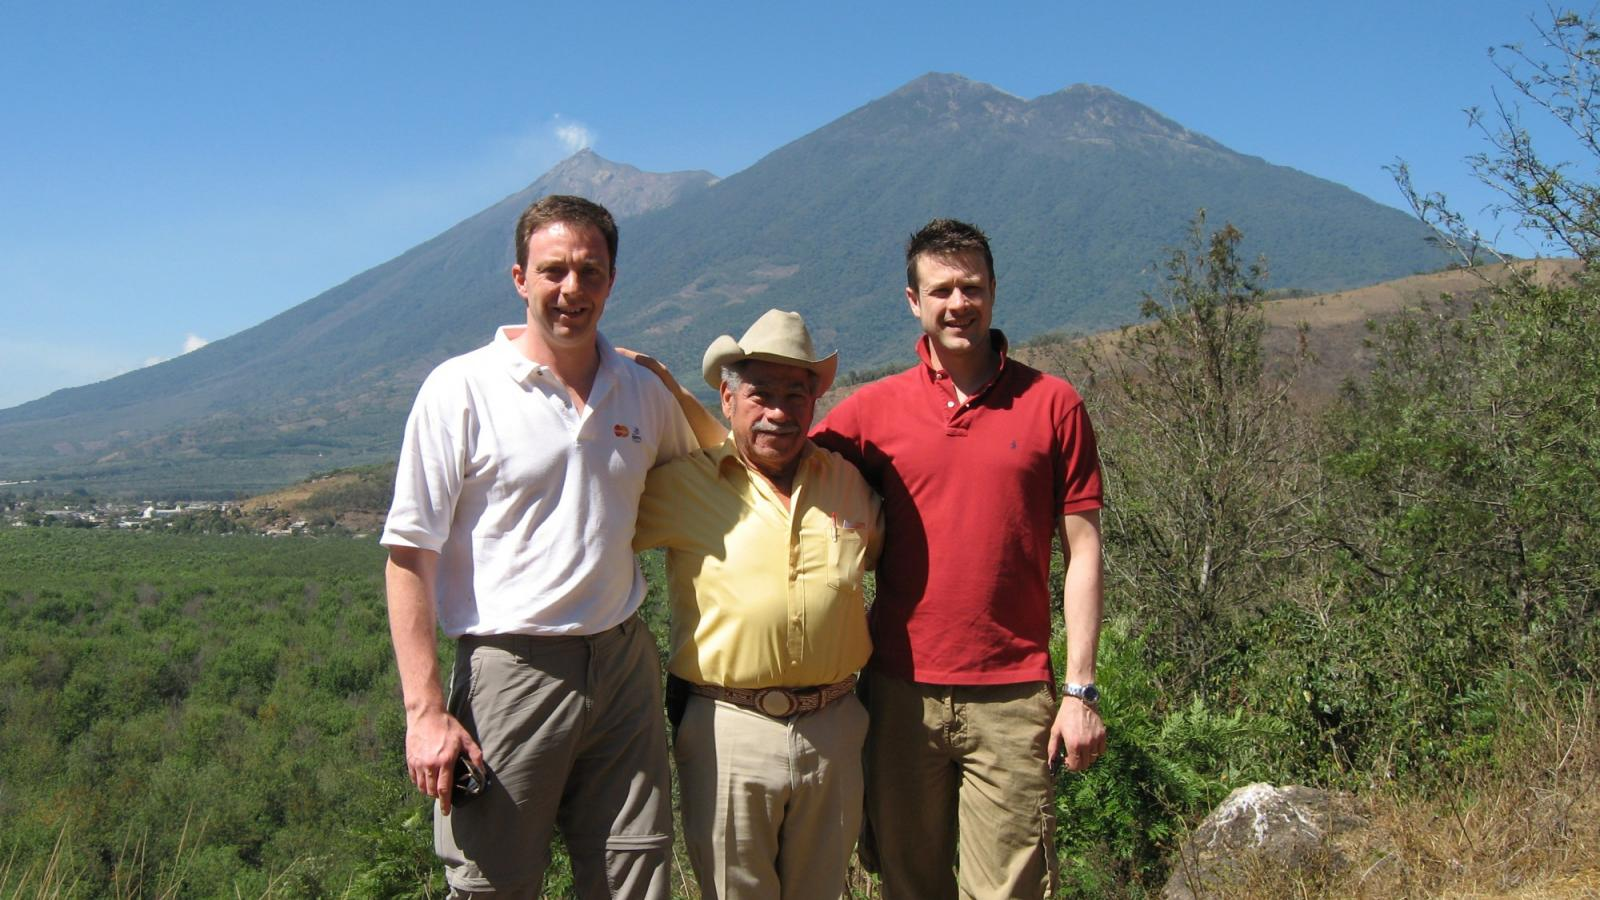 Lincoln & York Guatemala origin trip 2007